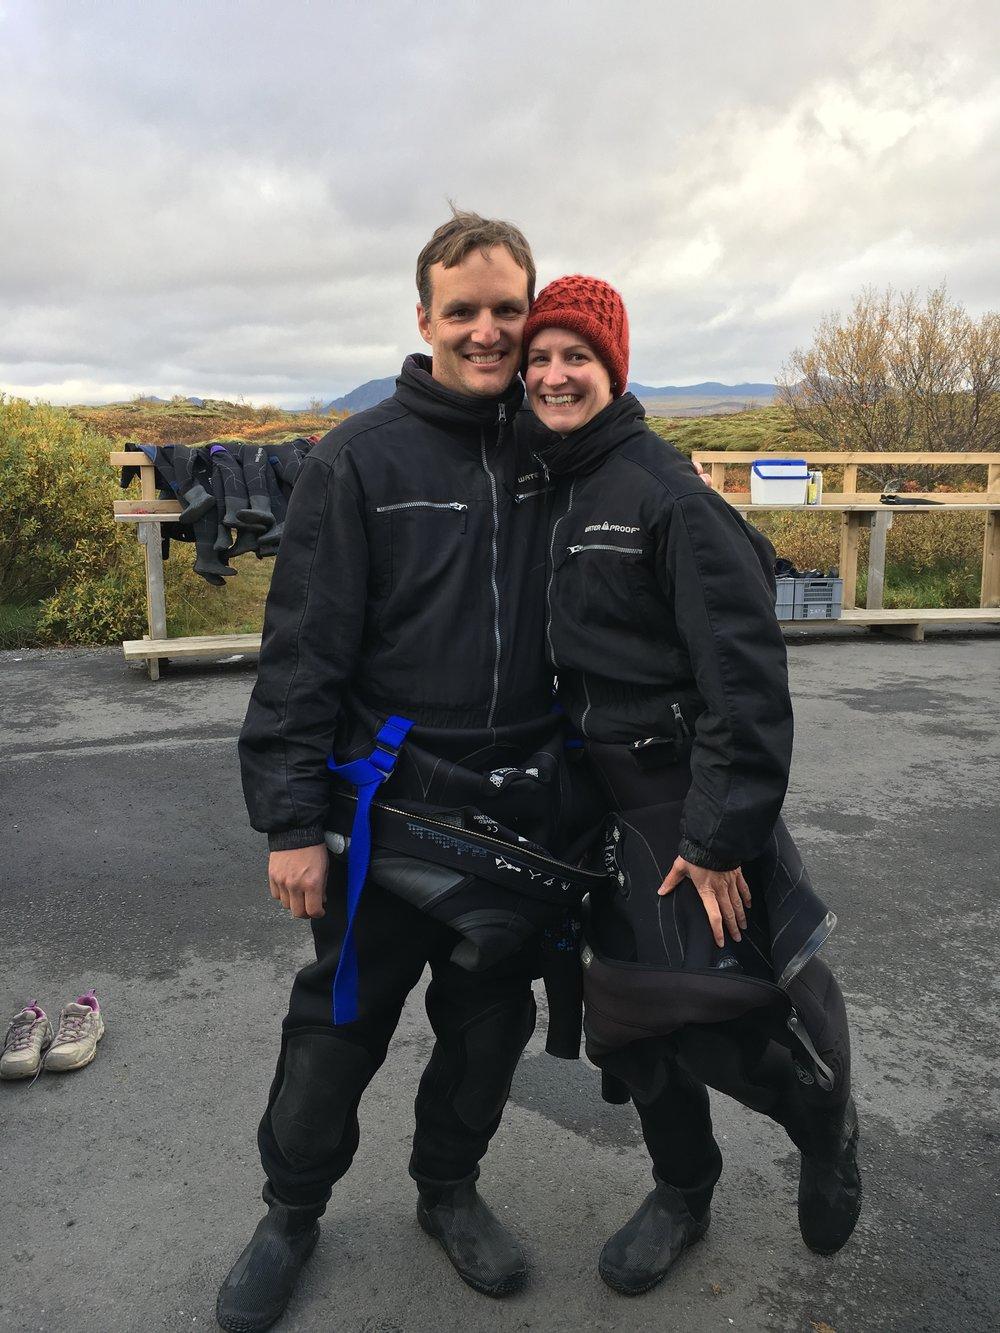 Snorkeling the Silfra Fissure, Iceland, October 2017